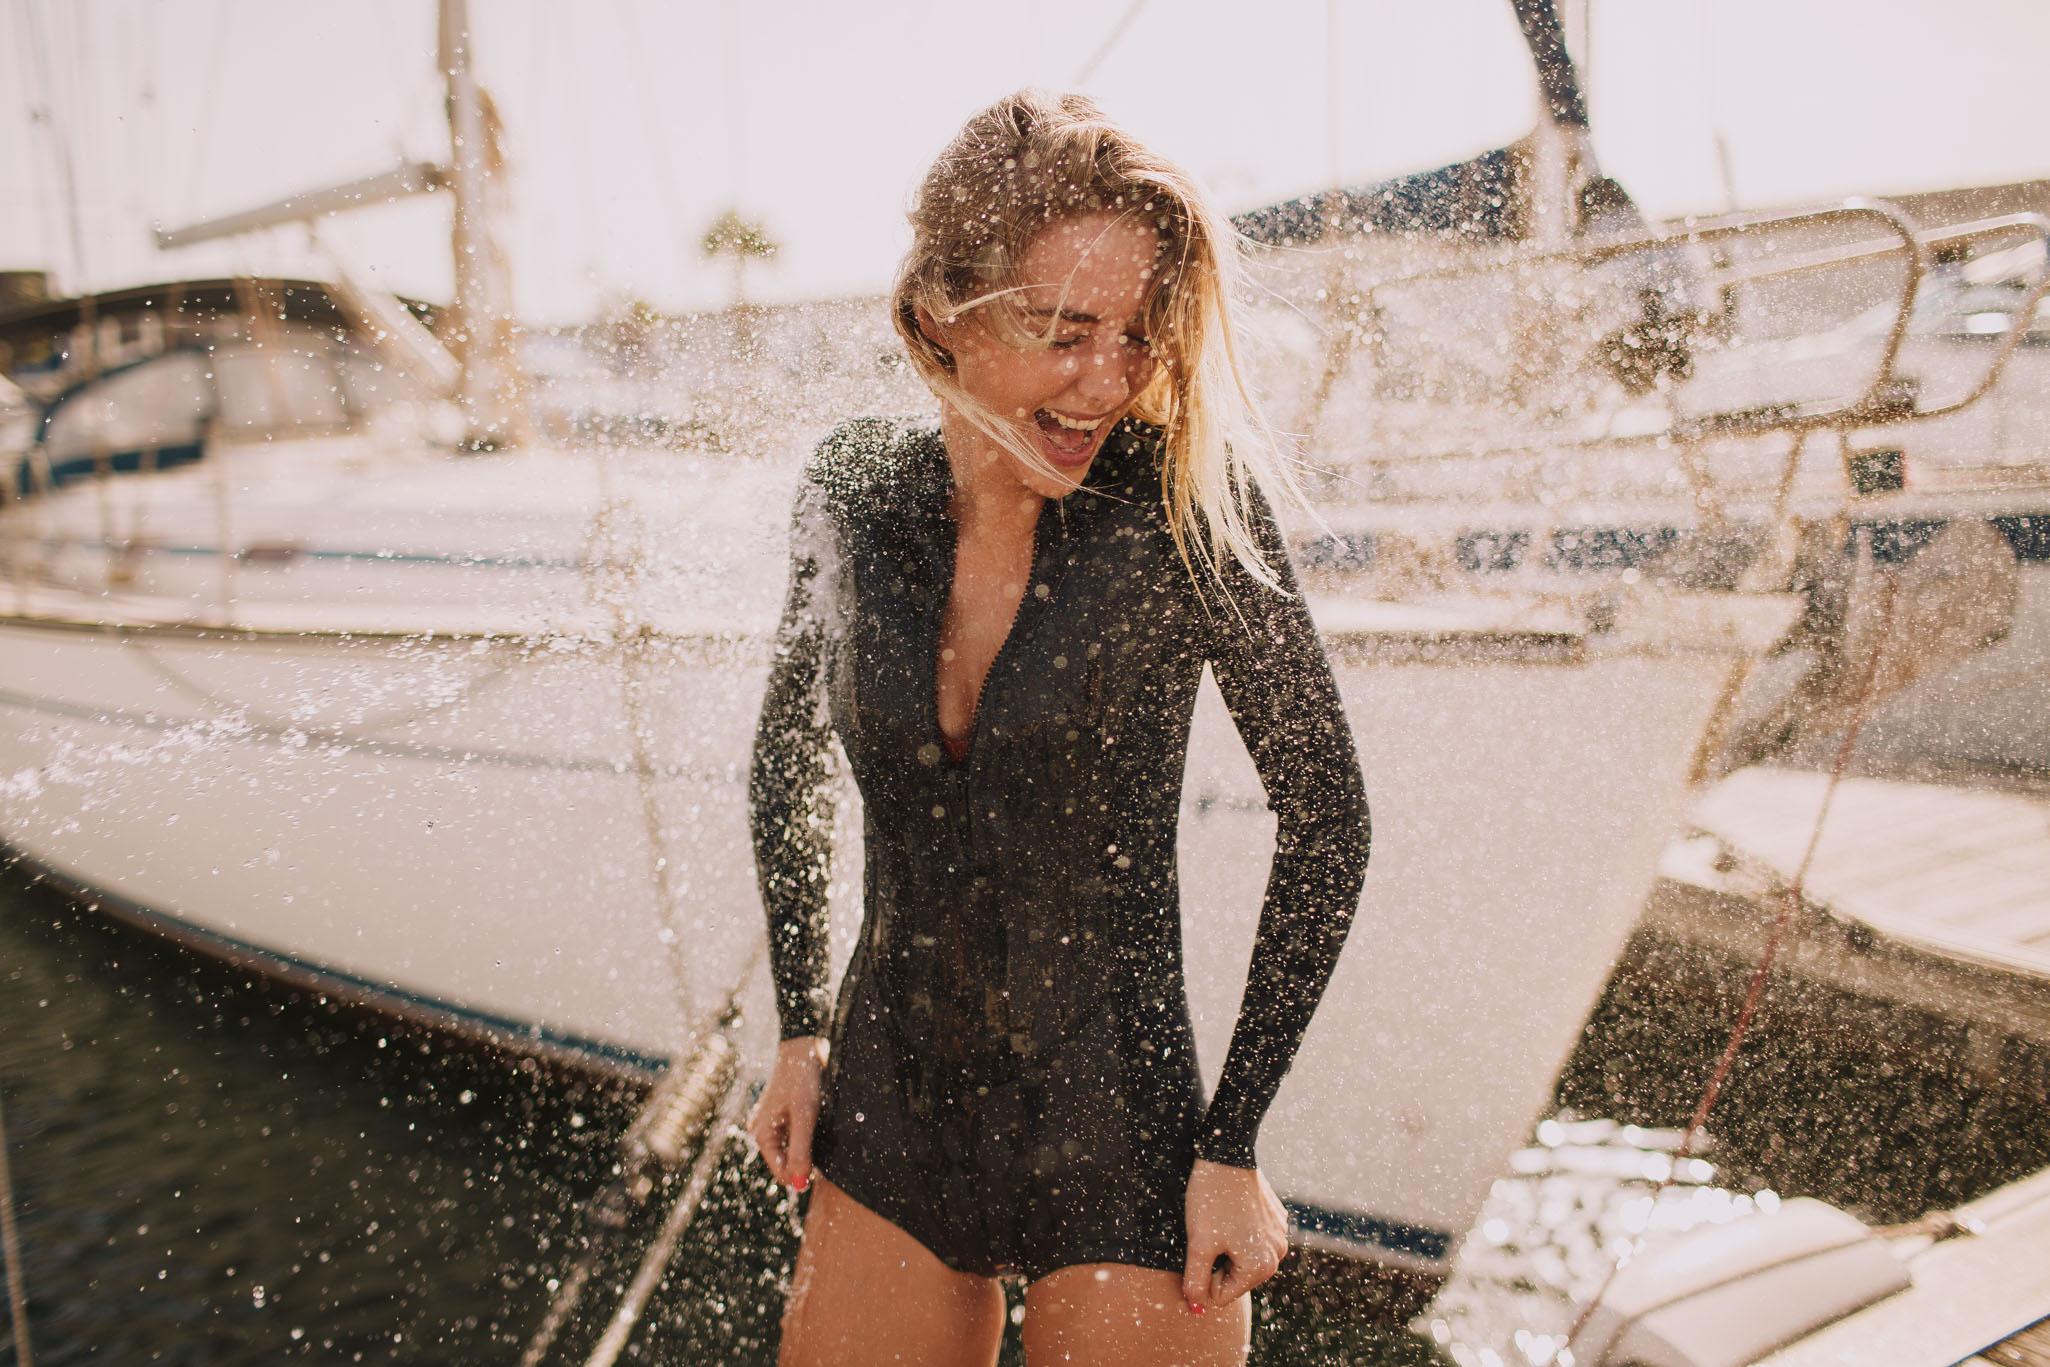 Swimwear-photographer-jeremy-boyer-maillot-de-bain-lifestyle-mode-fashion-swimsuit-12.jpg